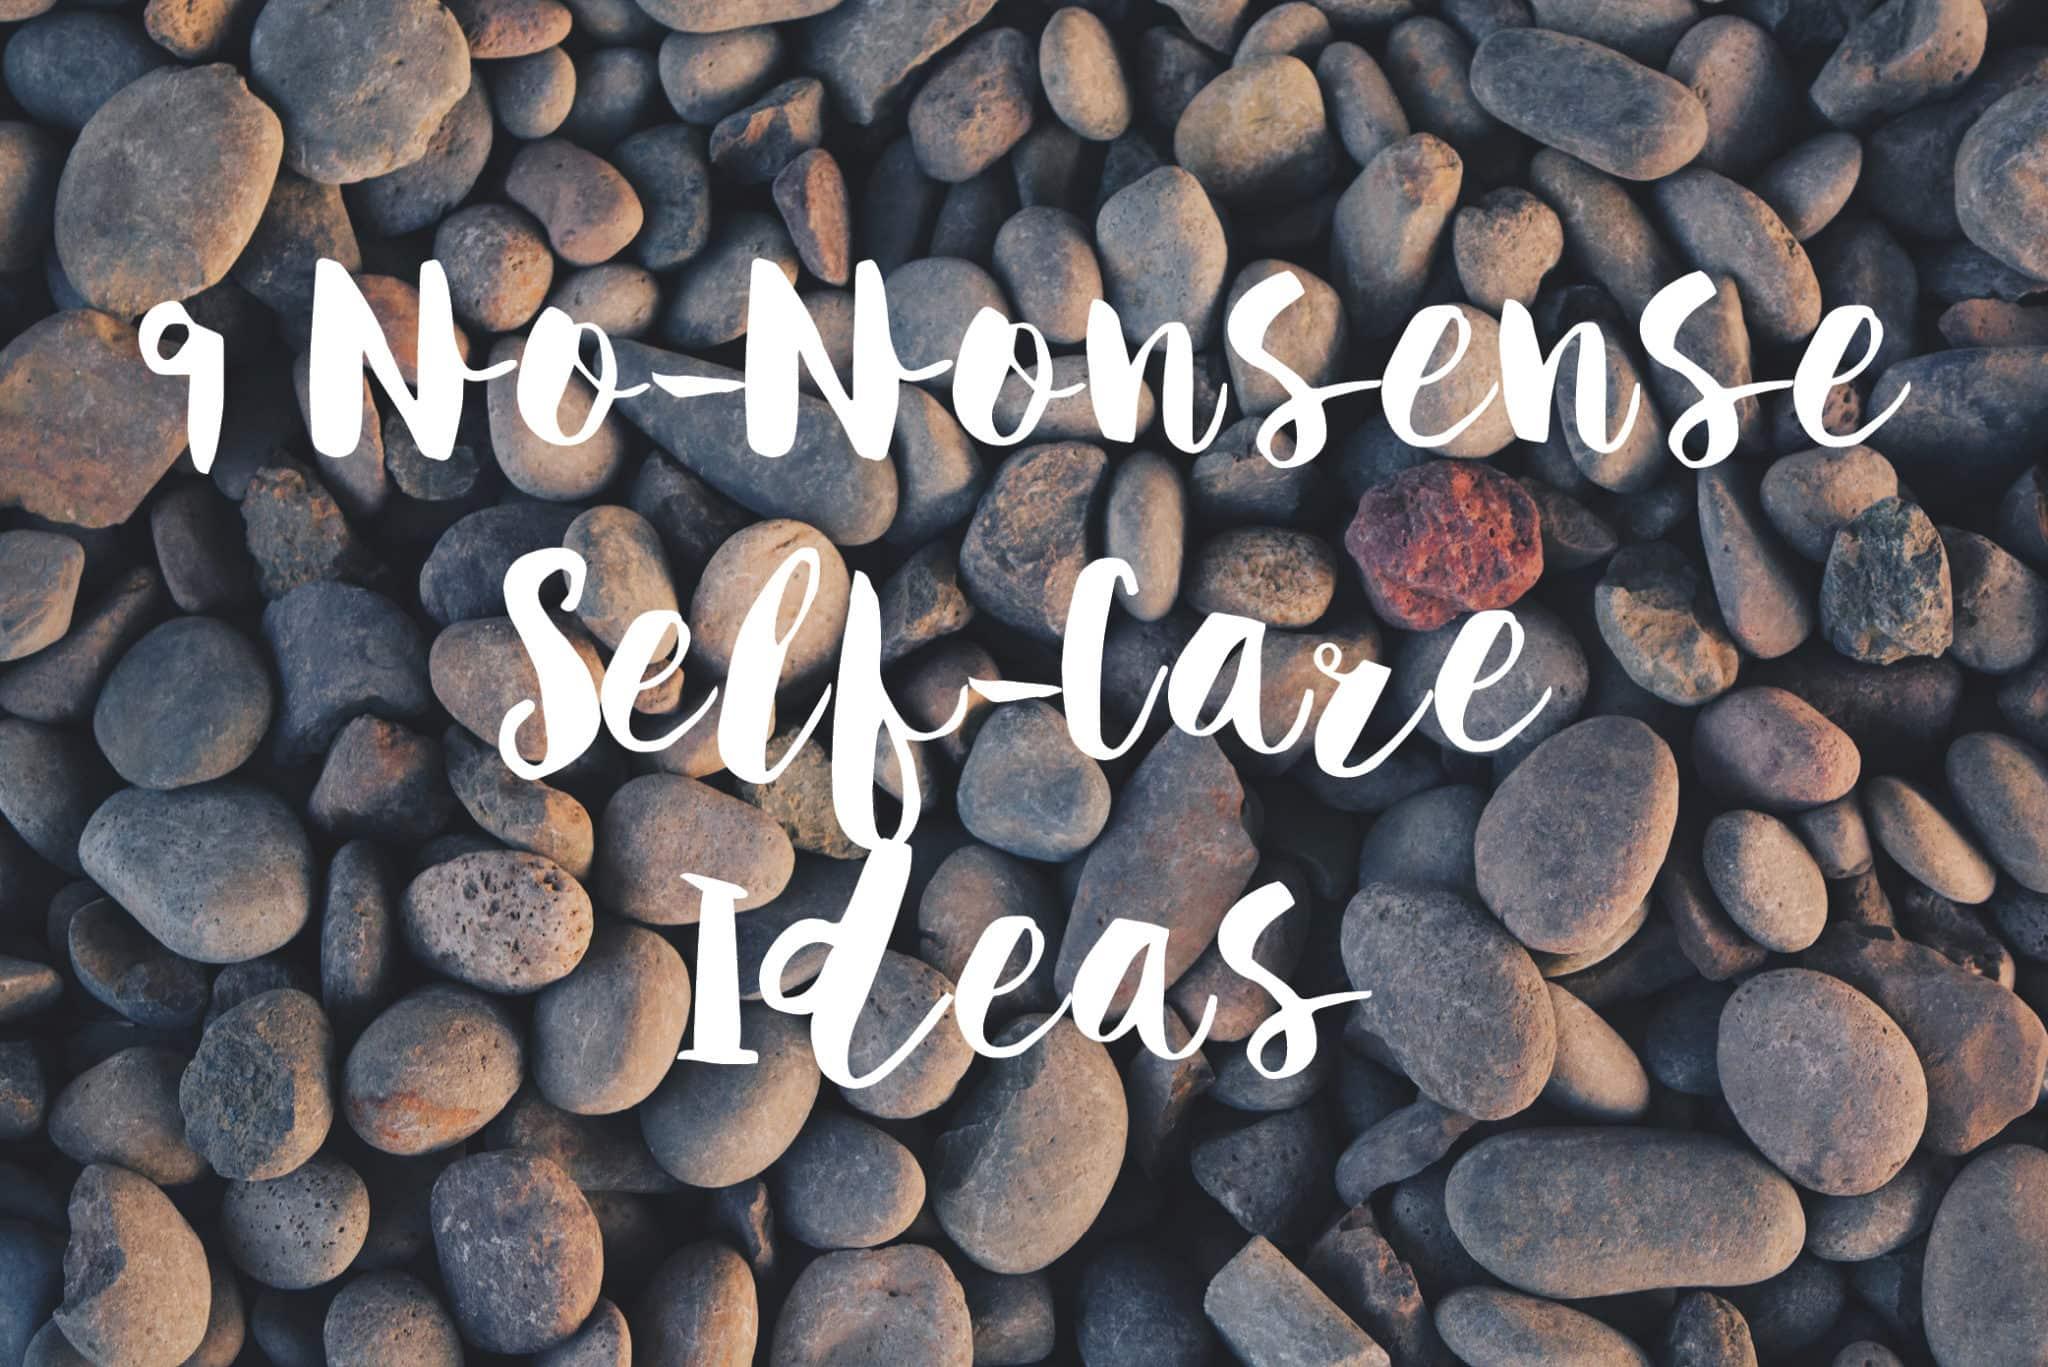 No-Nonsense Self-Care Ideas